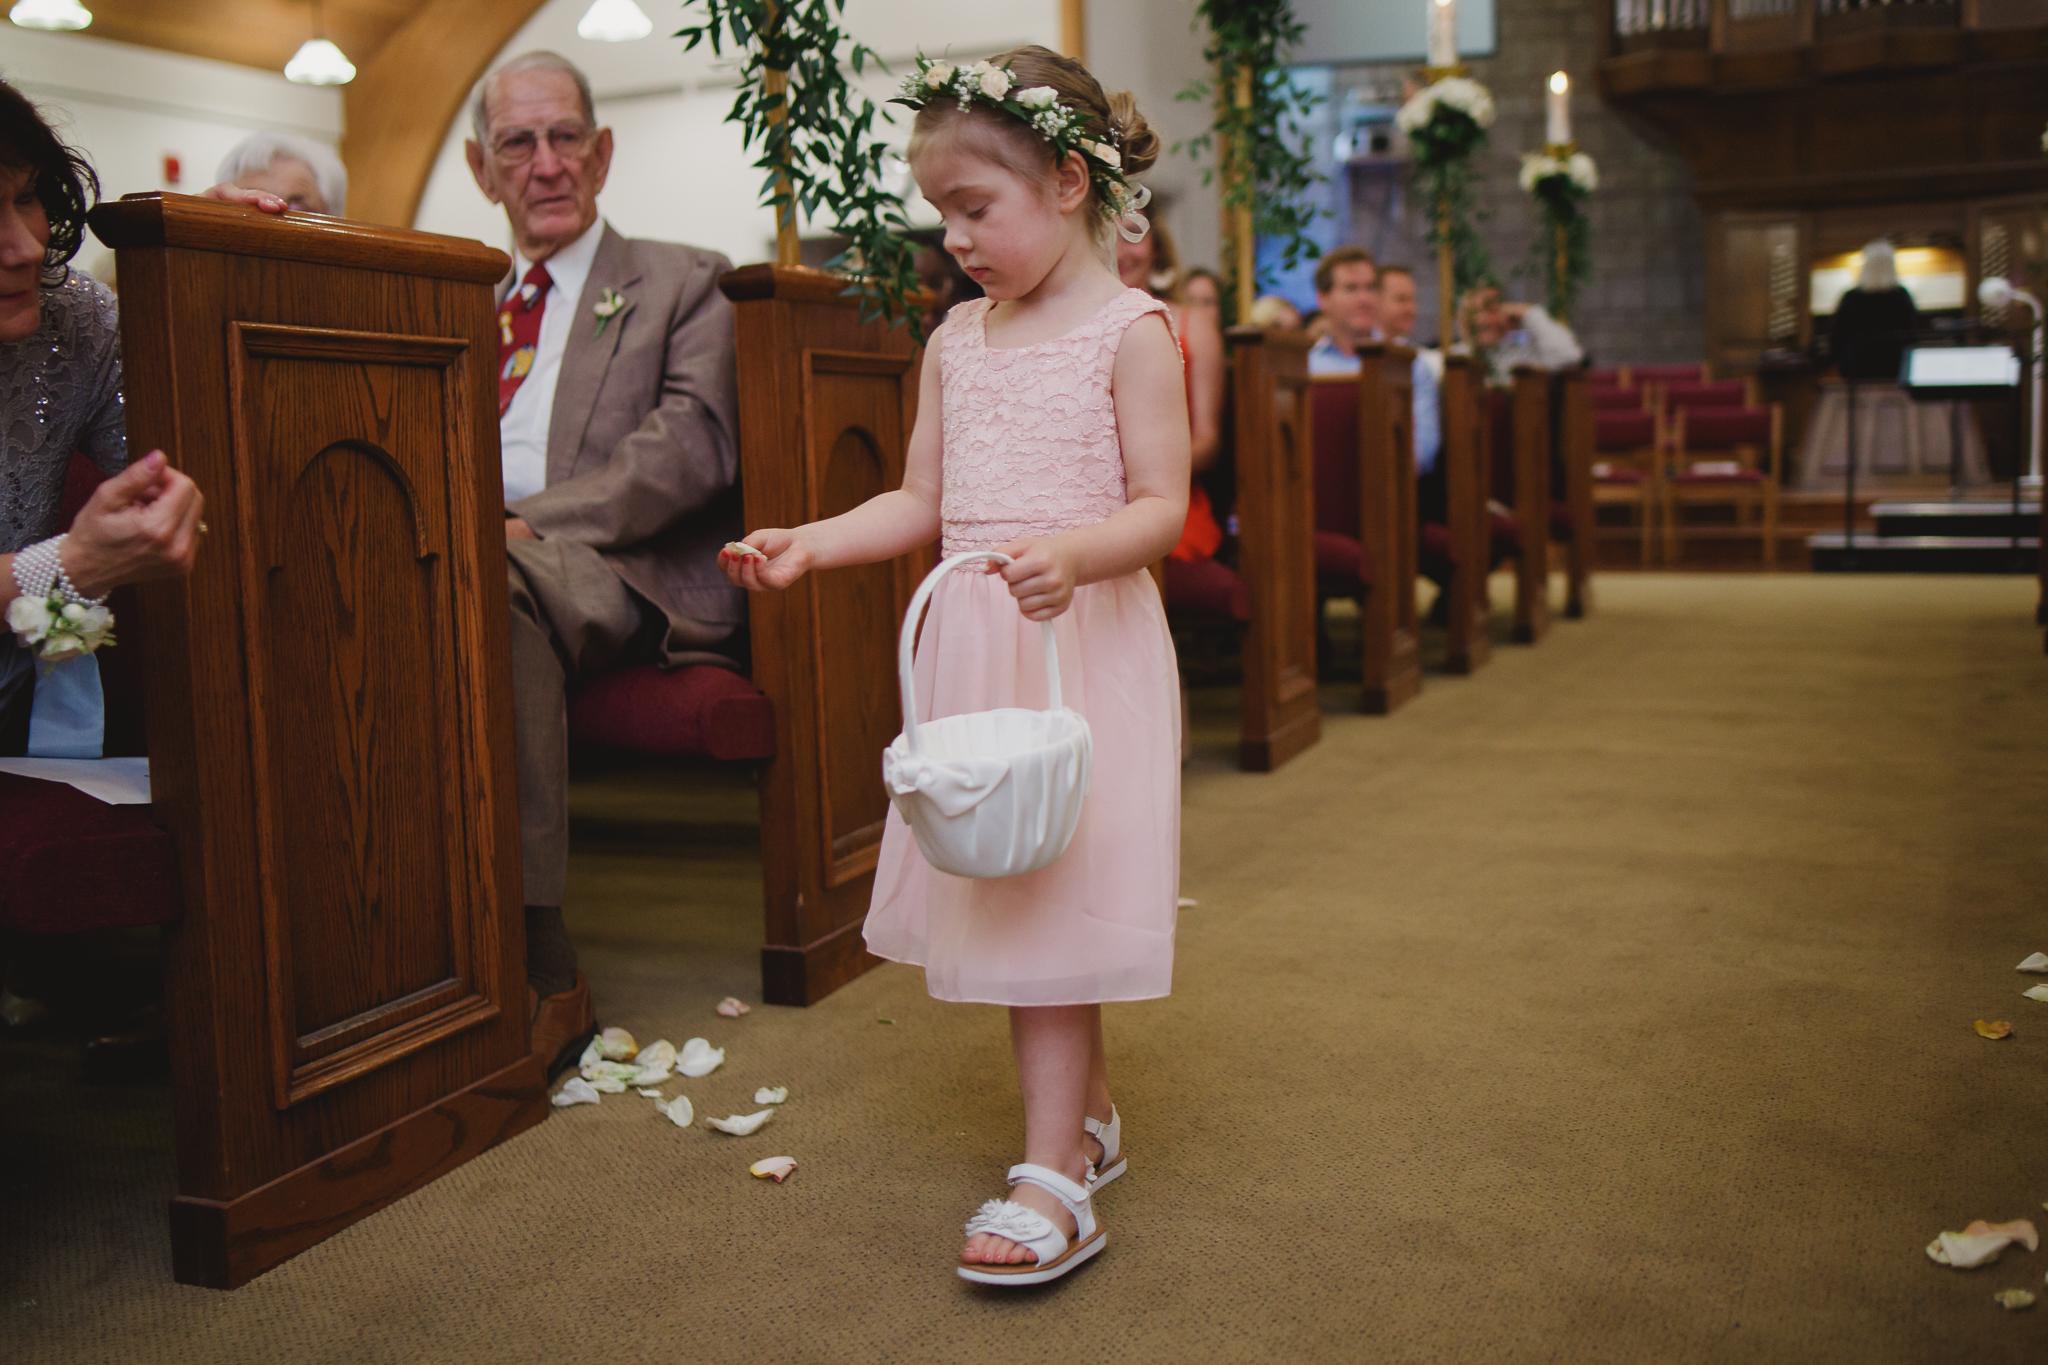 Michael and Kelly - the ashton depot - wedding DFW - wedding photographer- elizalde photography (25 of 150).jpg